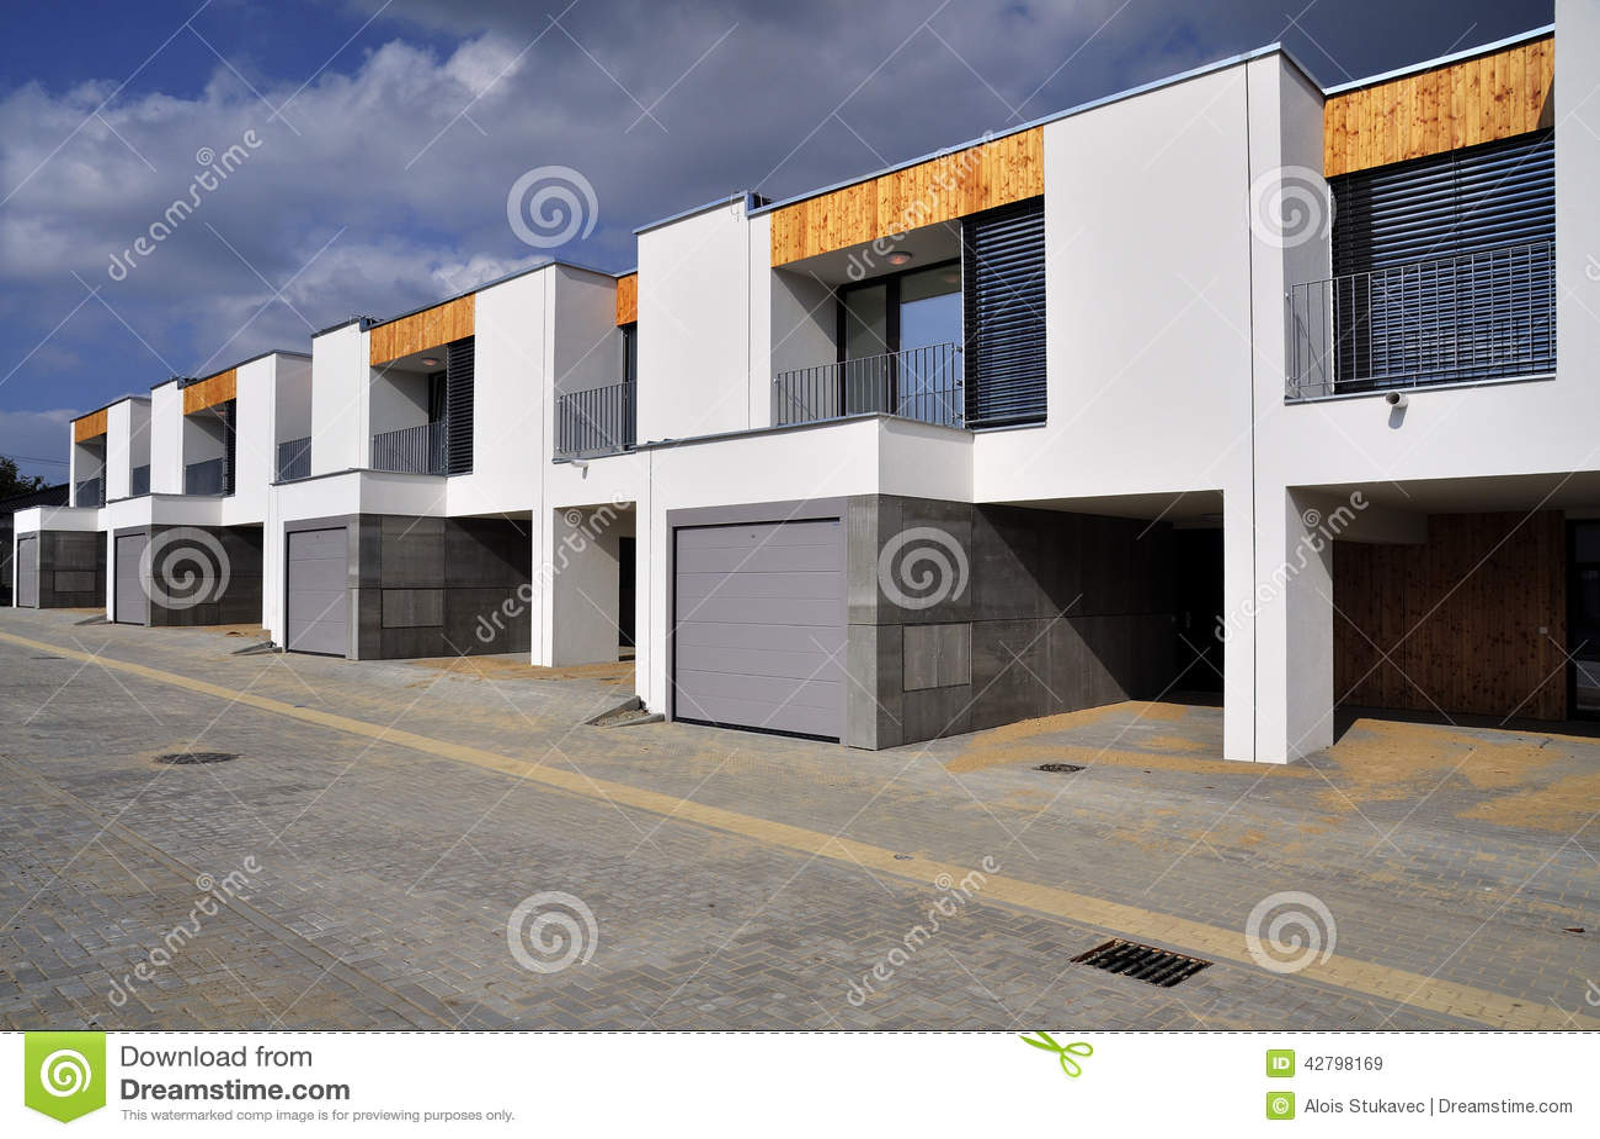 Moderne eihenhäuser Stockfoto - Bild: 42798169 size: 1300 x 942 post ID: 1 File size: 0 B